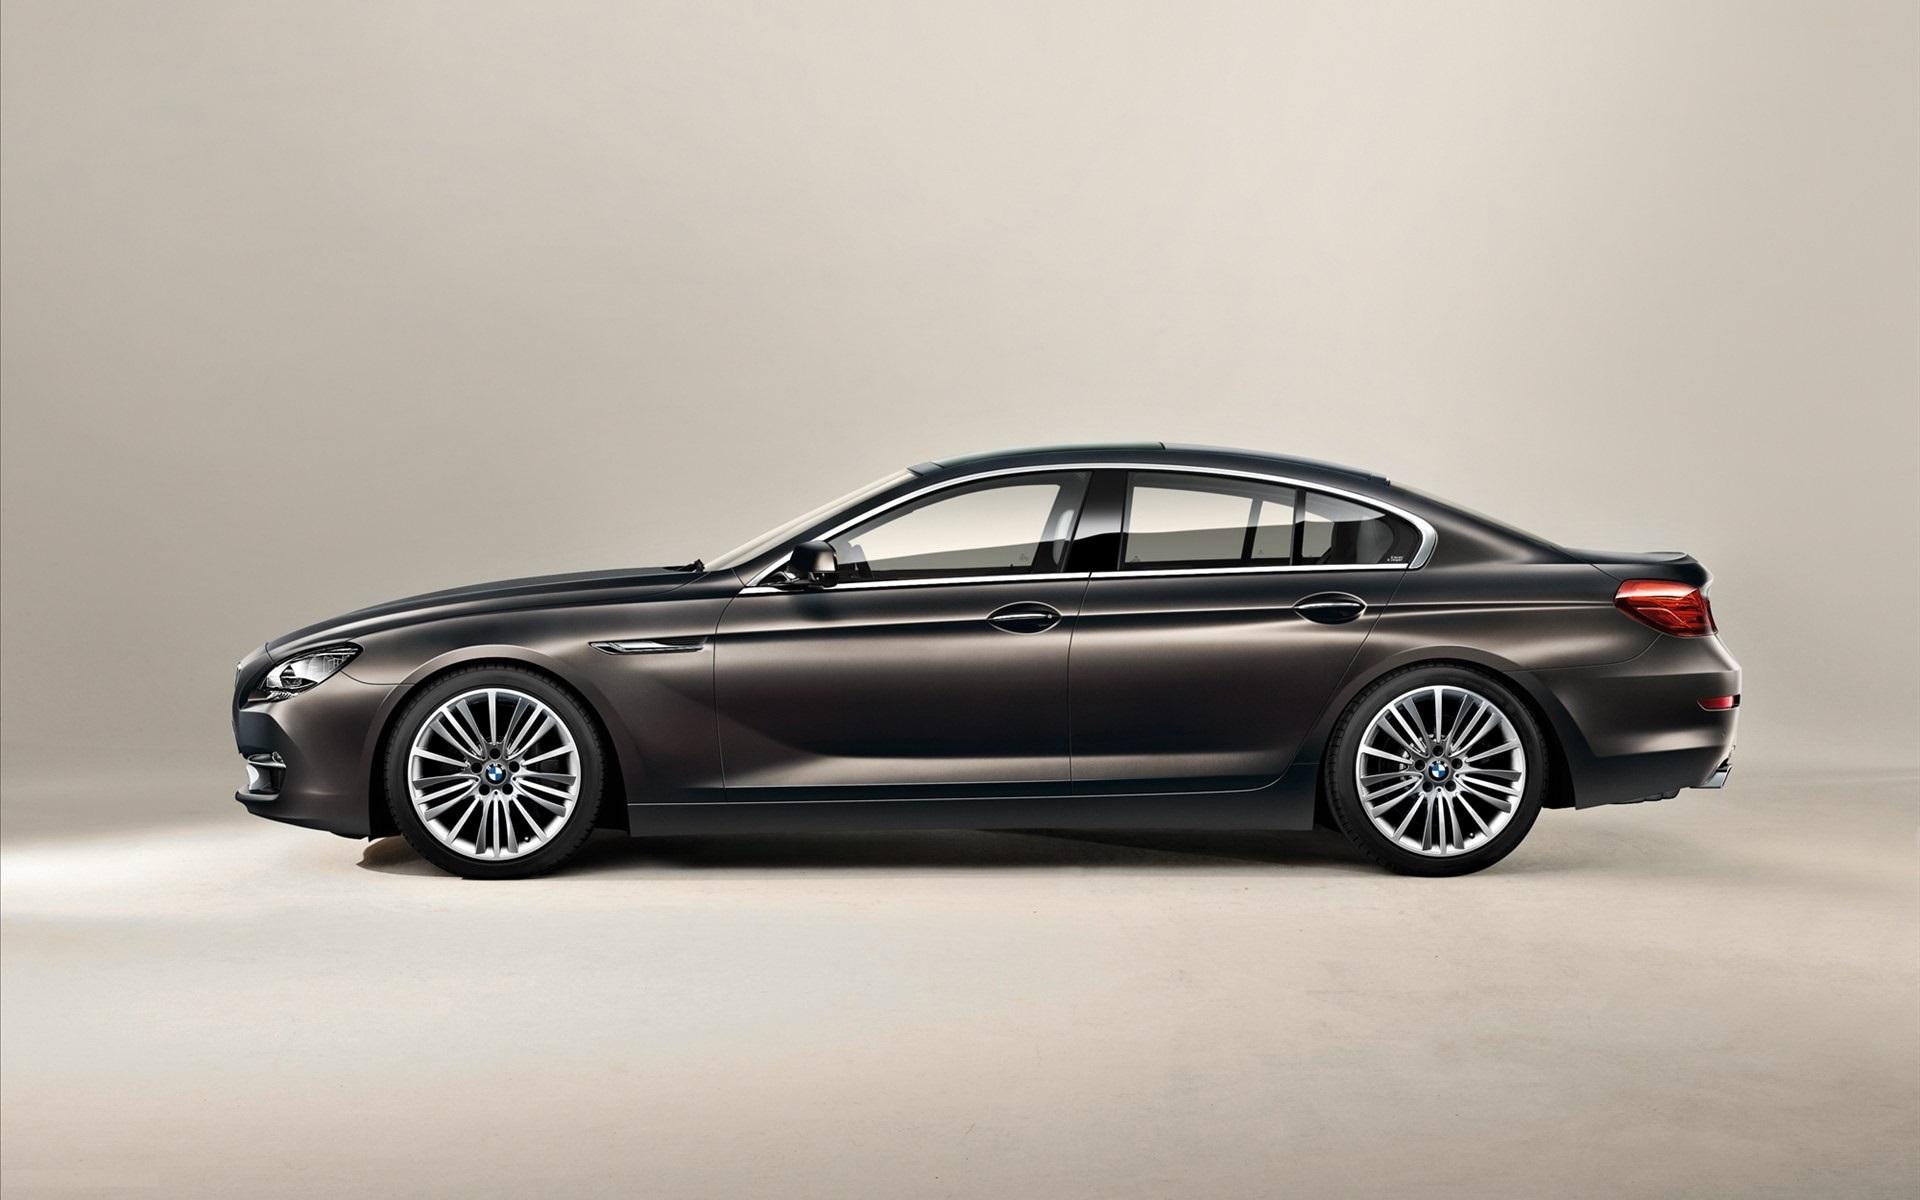 bmw-6-grey-gran-coupe-2013